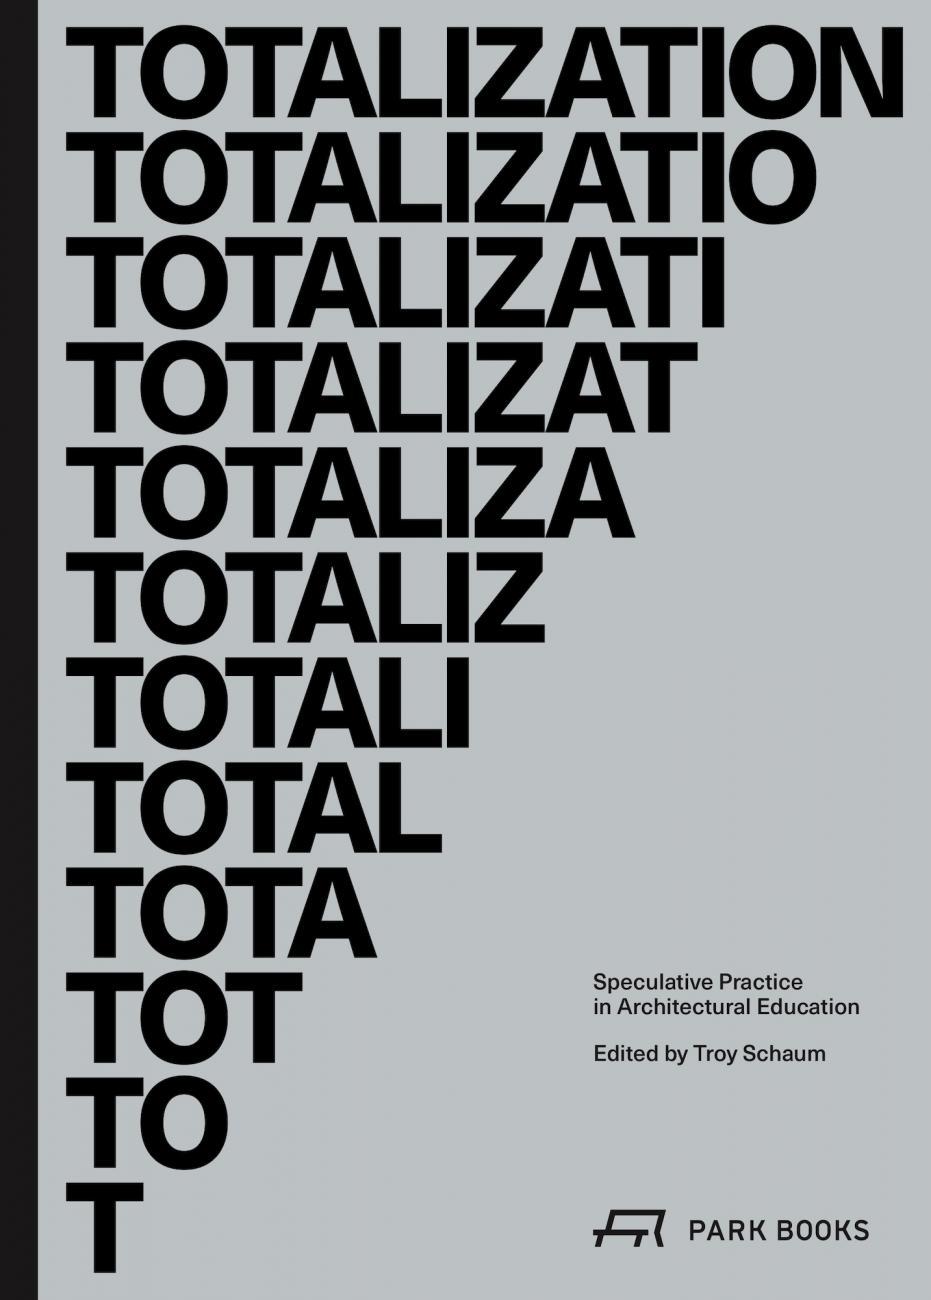 Totalization book cover